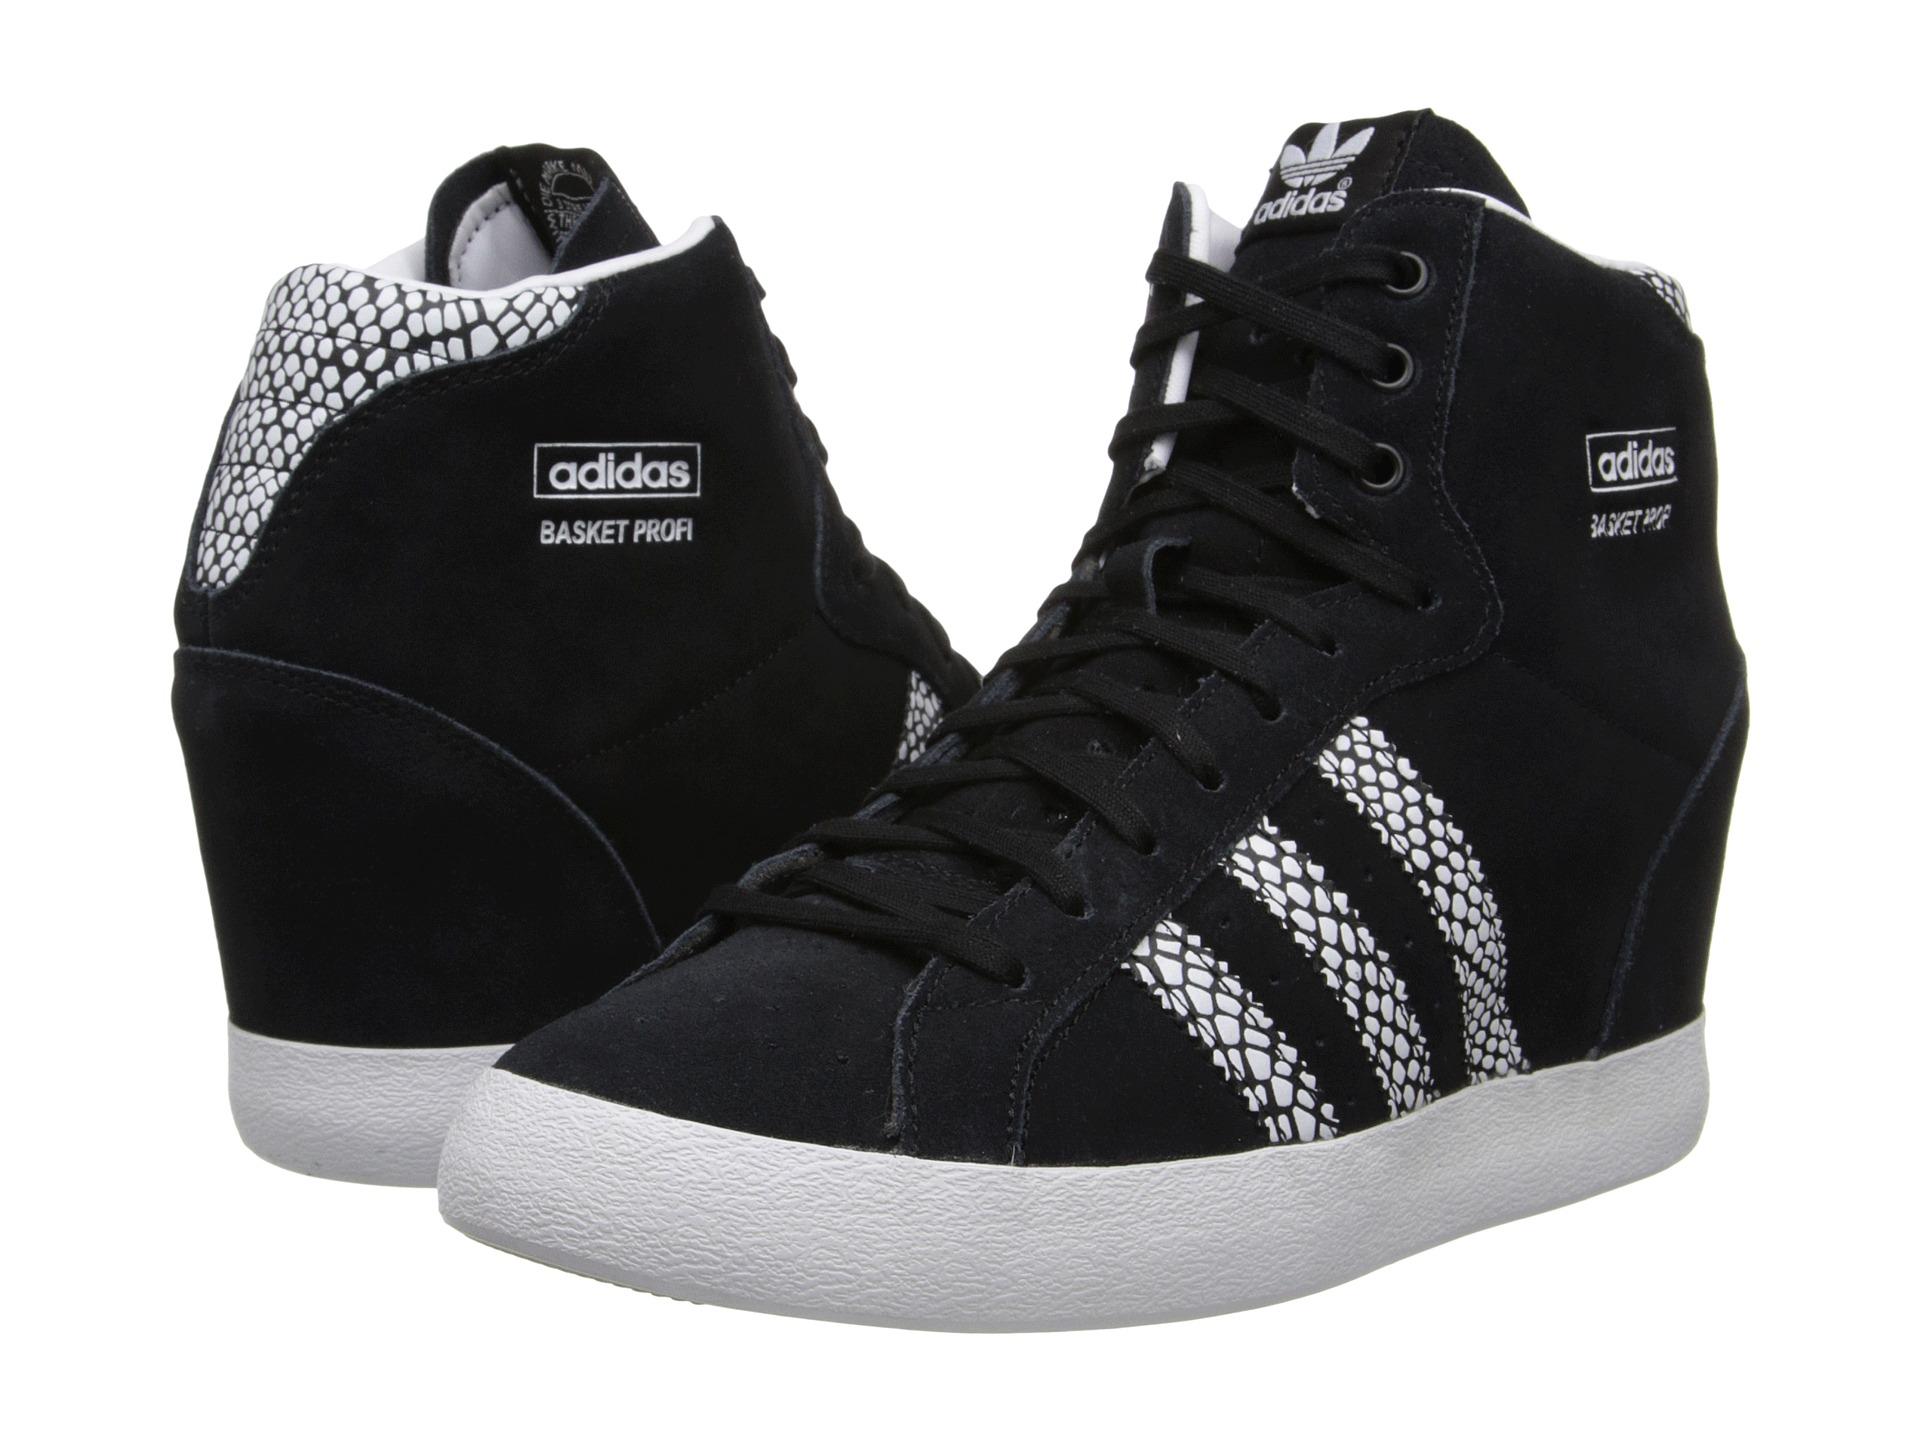 Related to adidas Originals - Shoes, Bags, Watches - Zappos.com